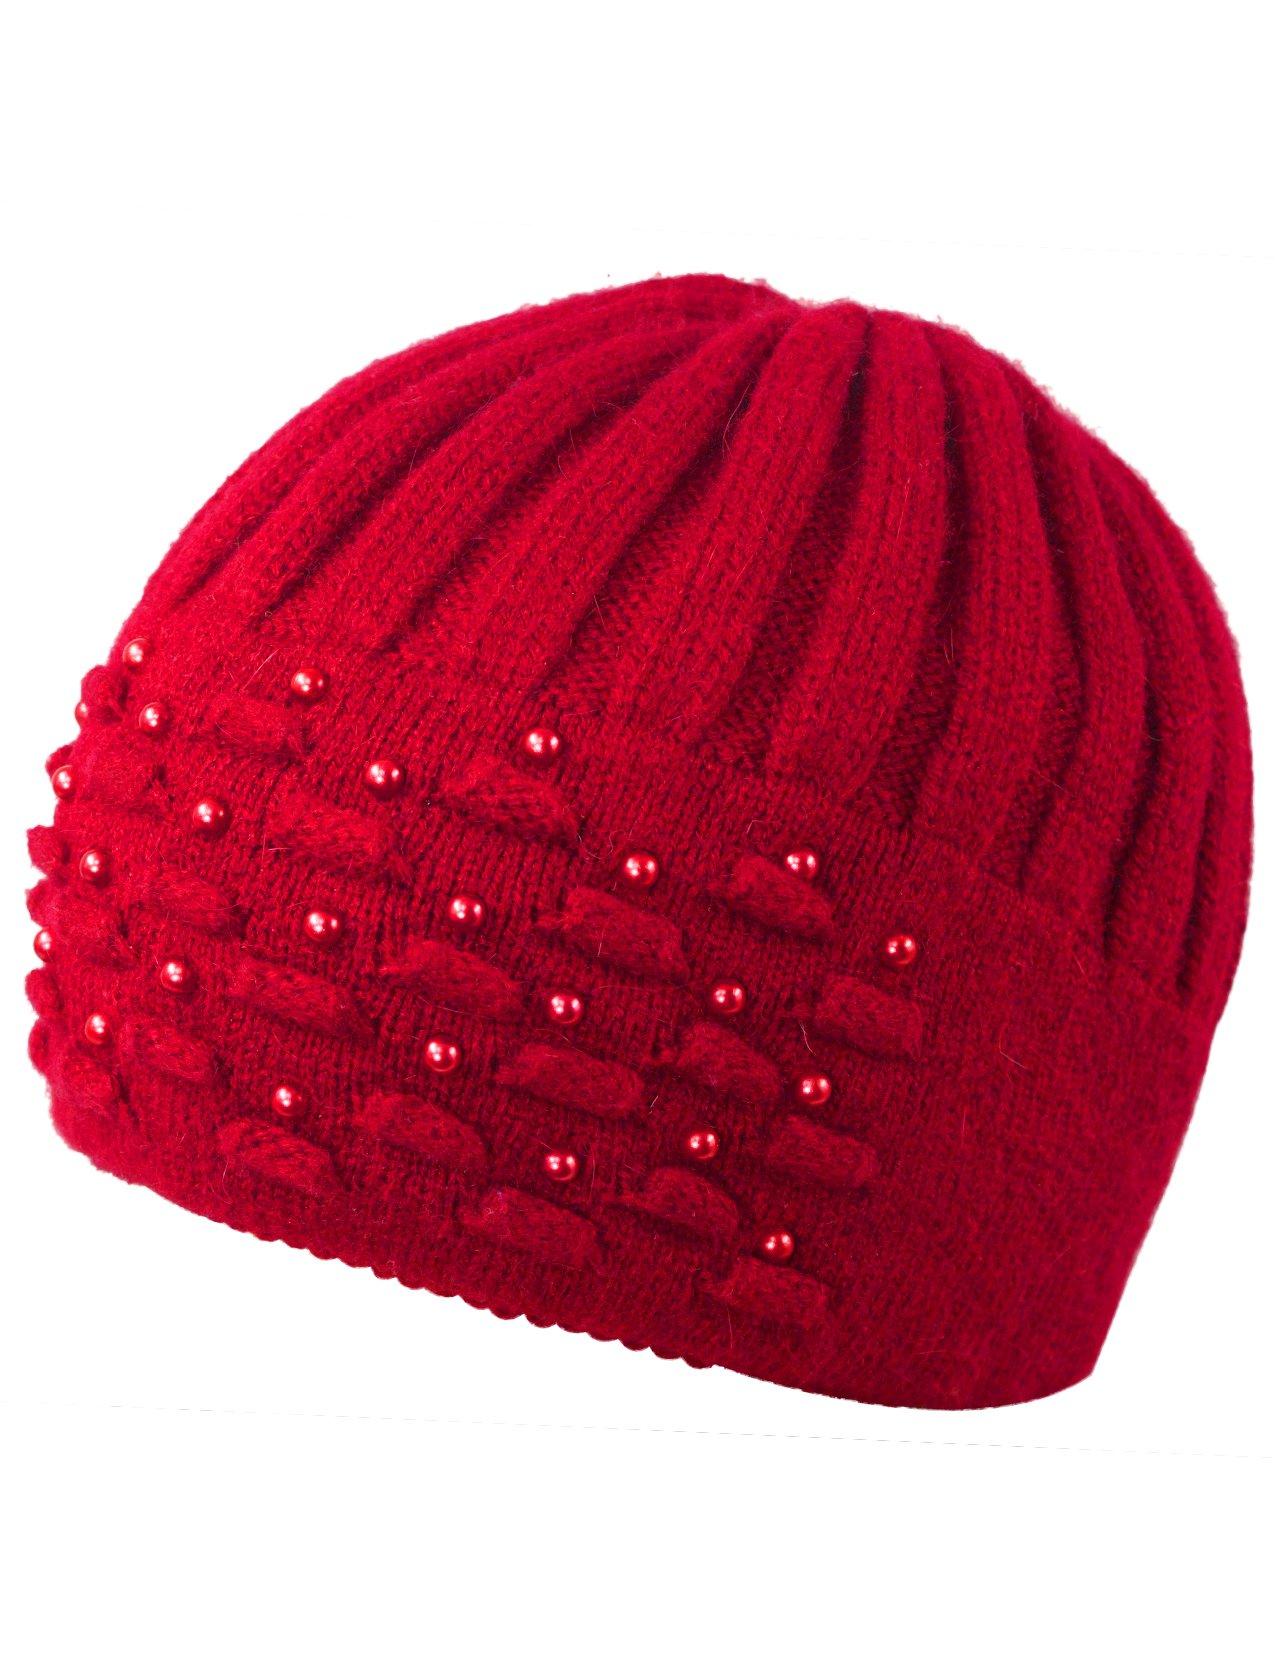 Dahlia Women's Angora Blend Beanie Hat - Dual Layer Pearl Accent Edge - Red